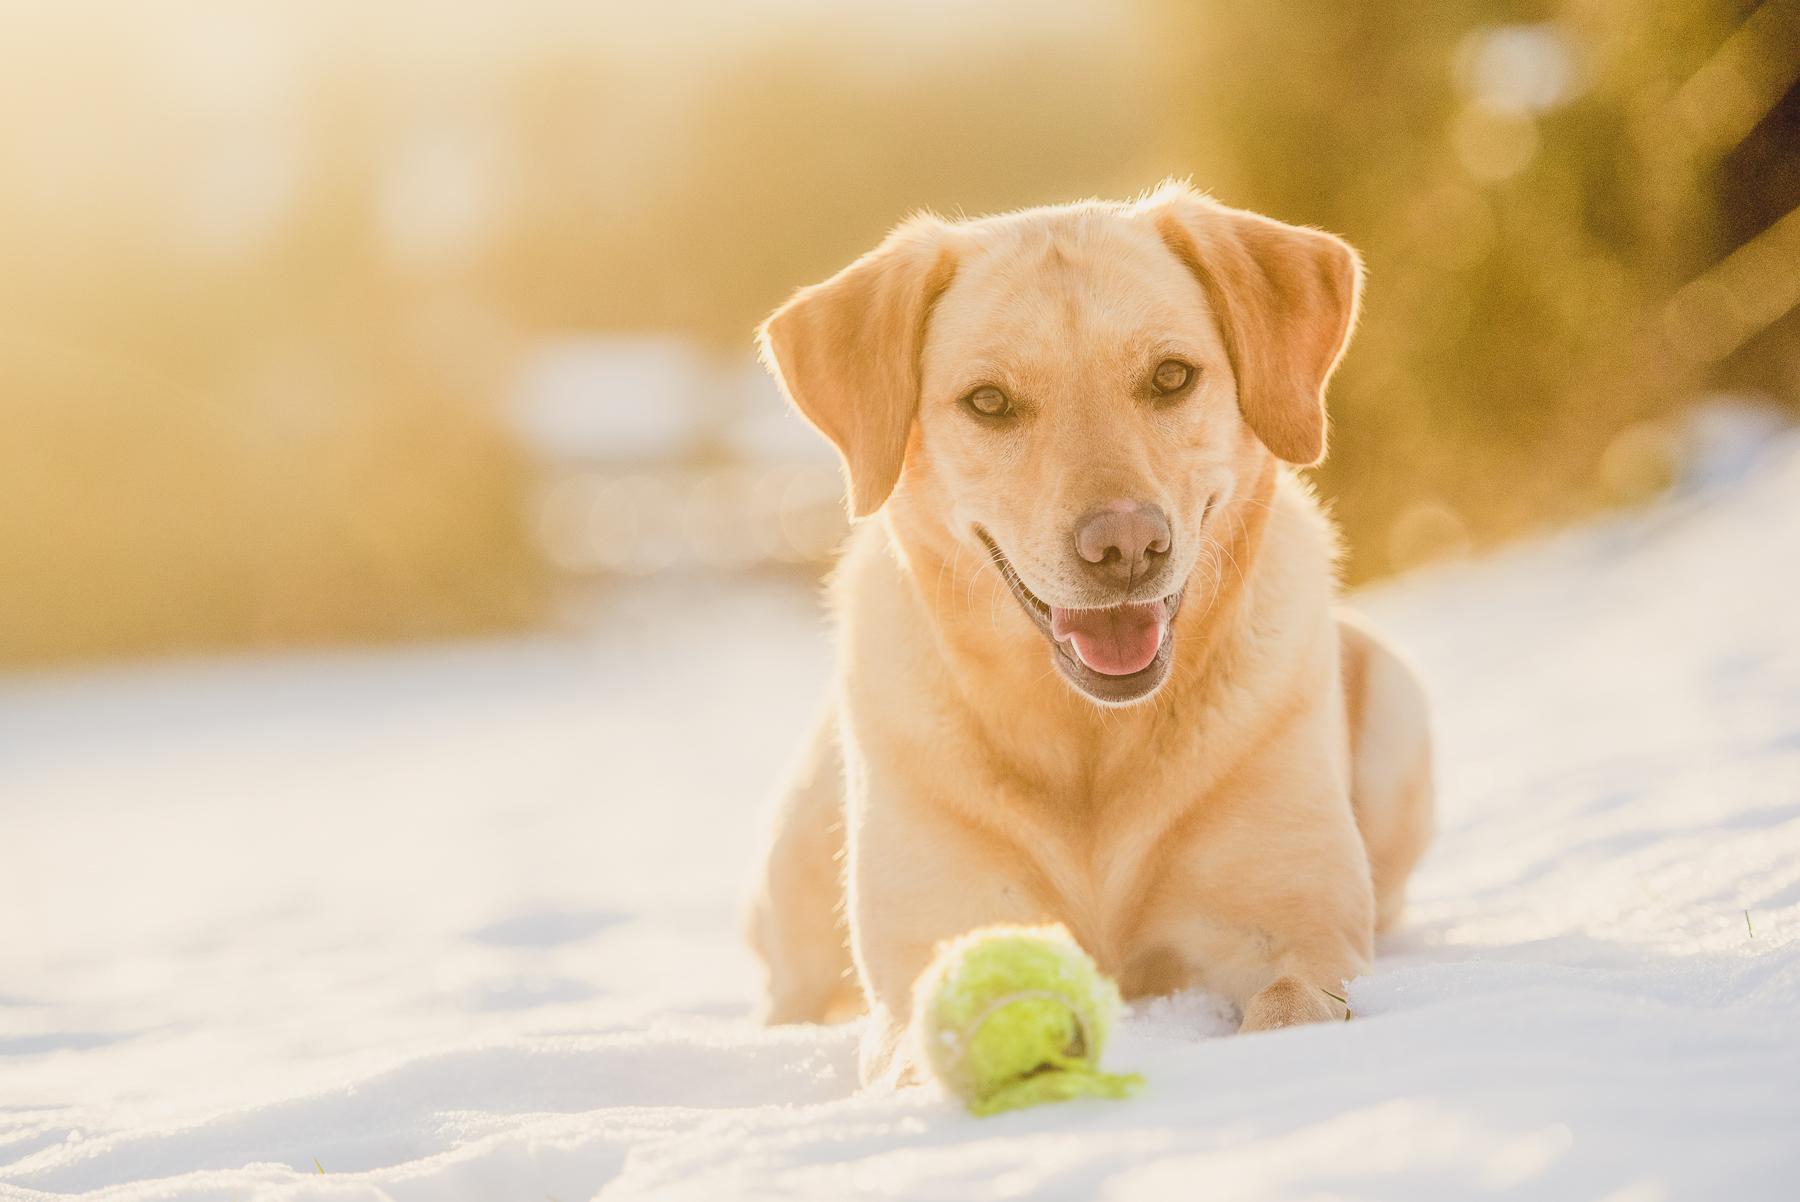 Sunlit labrador lying in the snow